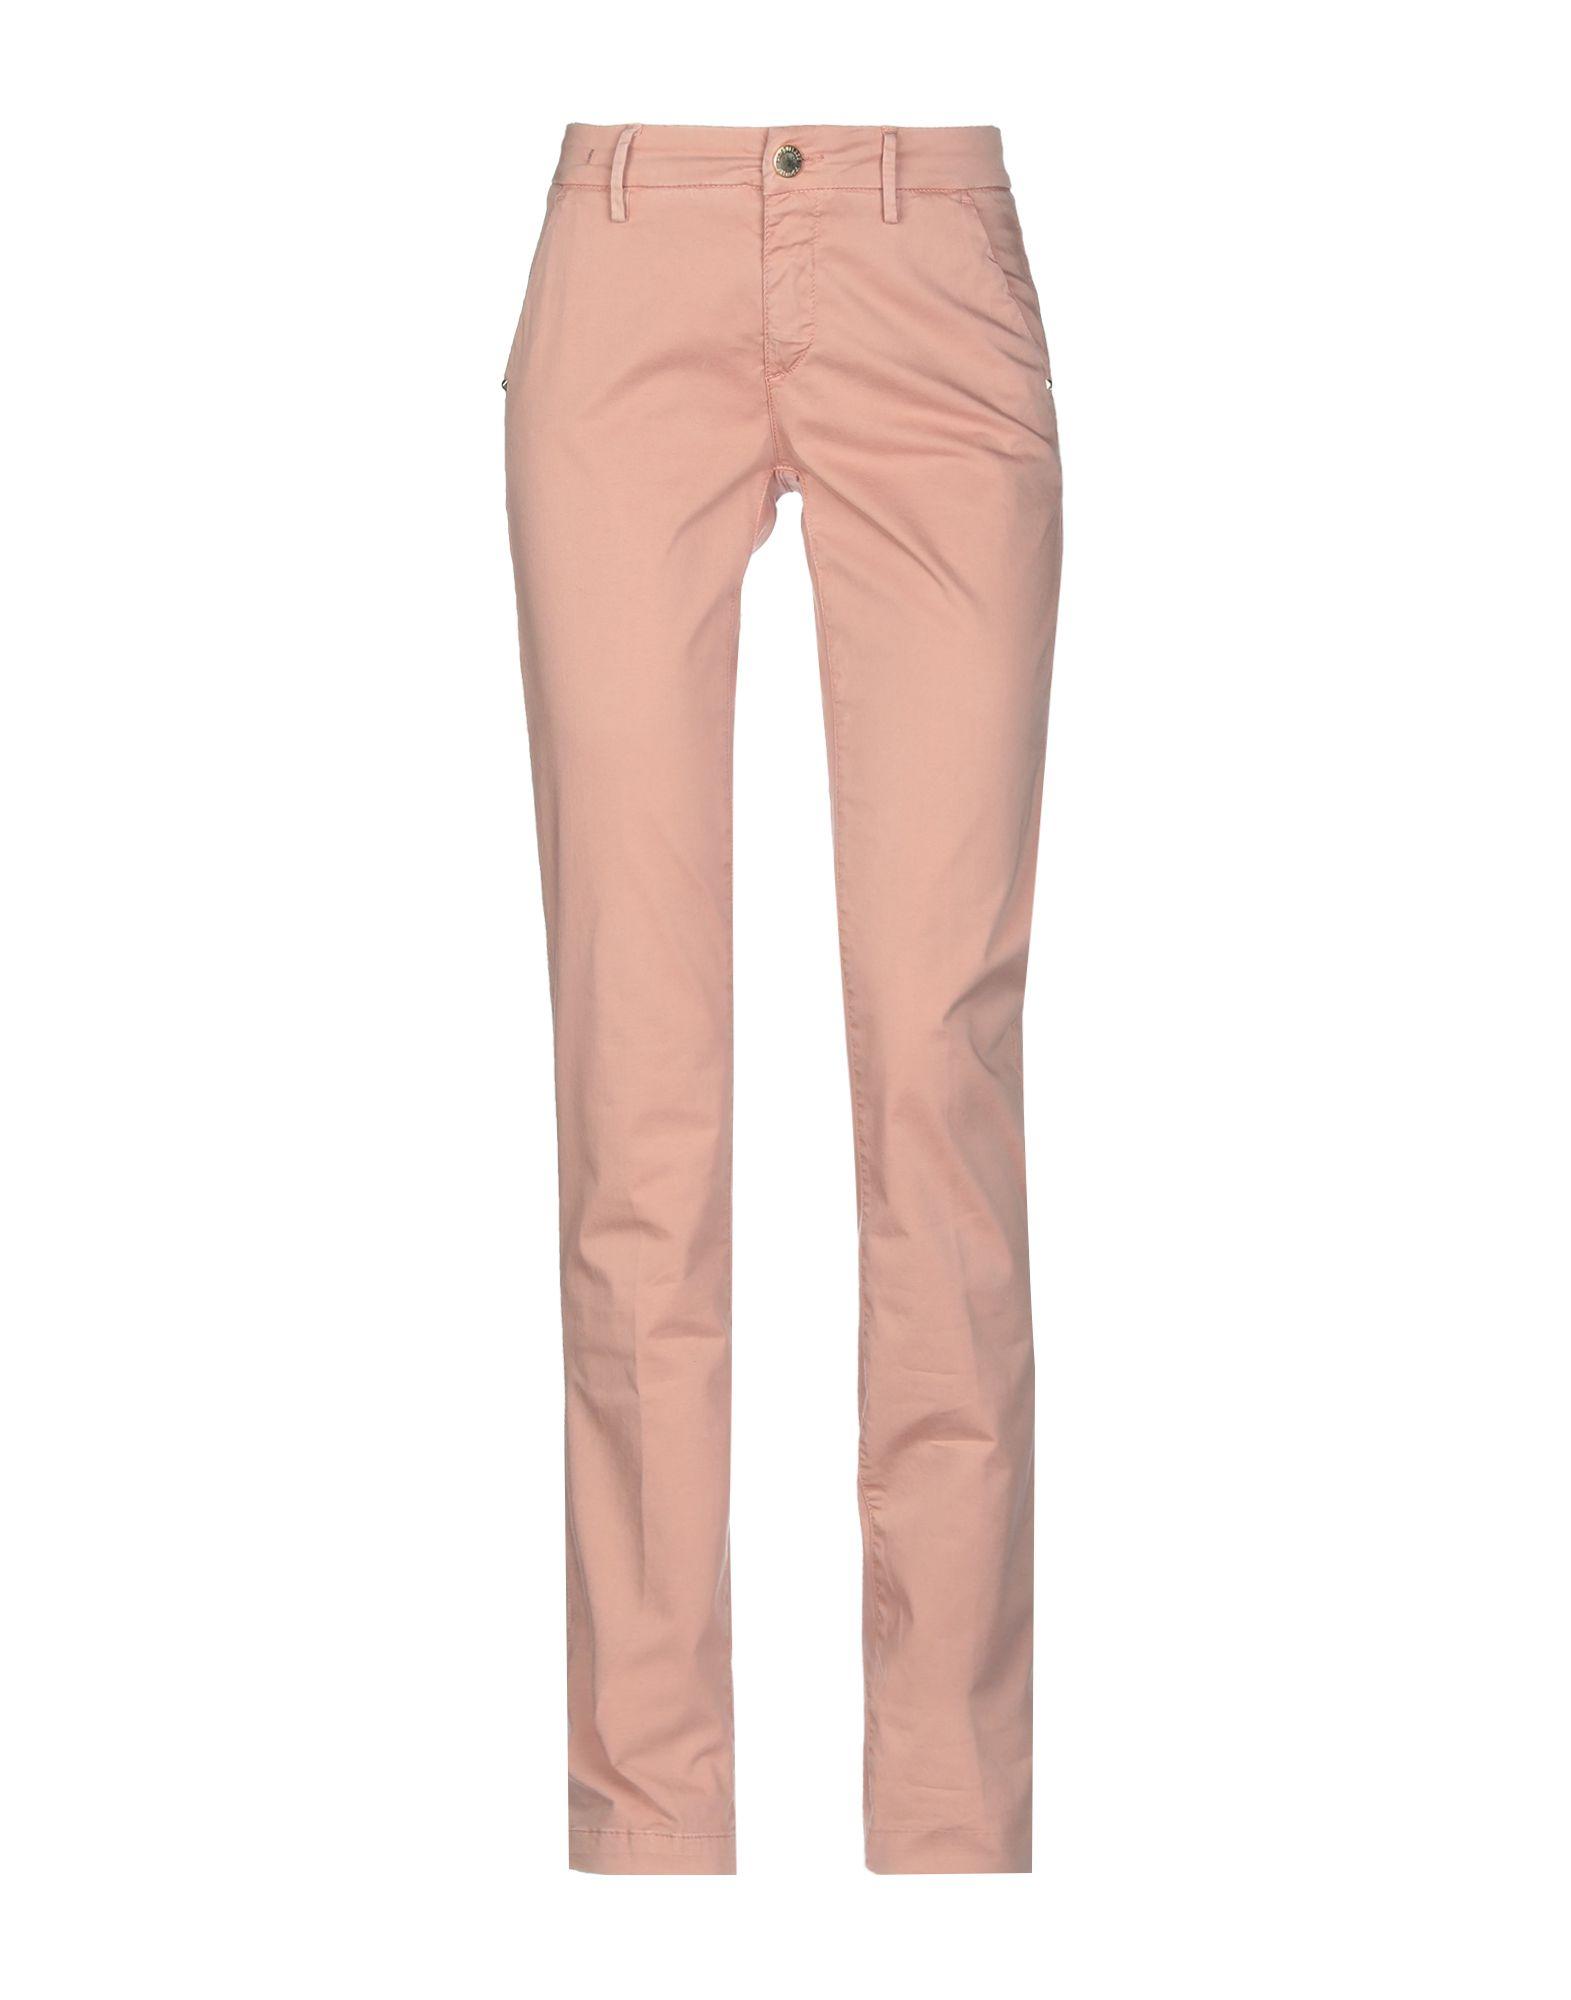 Pantalone Camouflage Ar And J. damen - 13044936GS